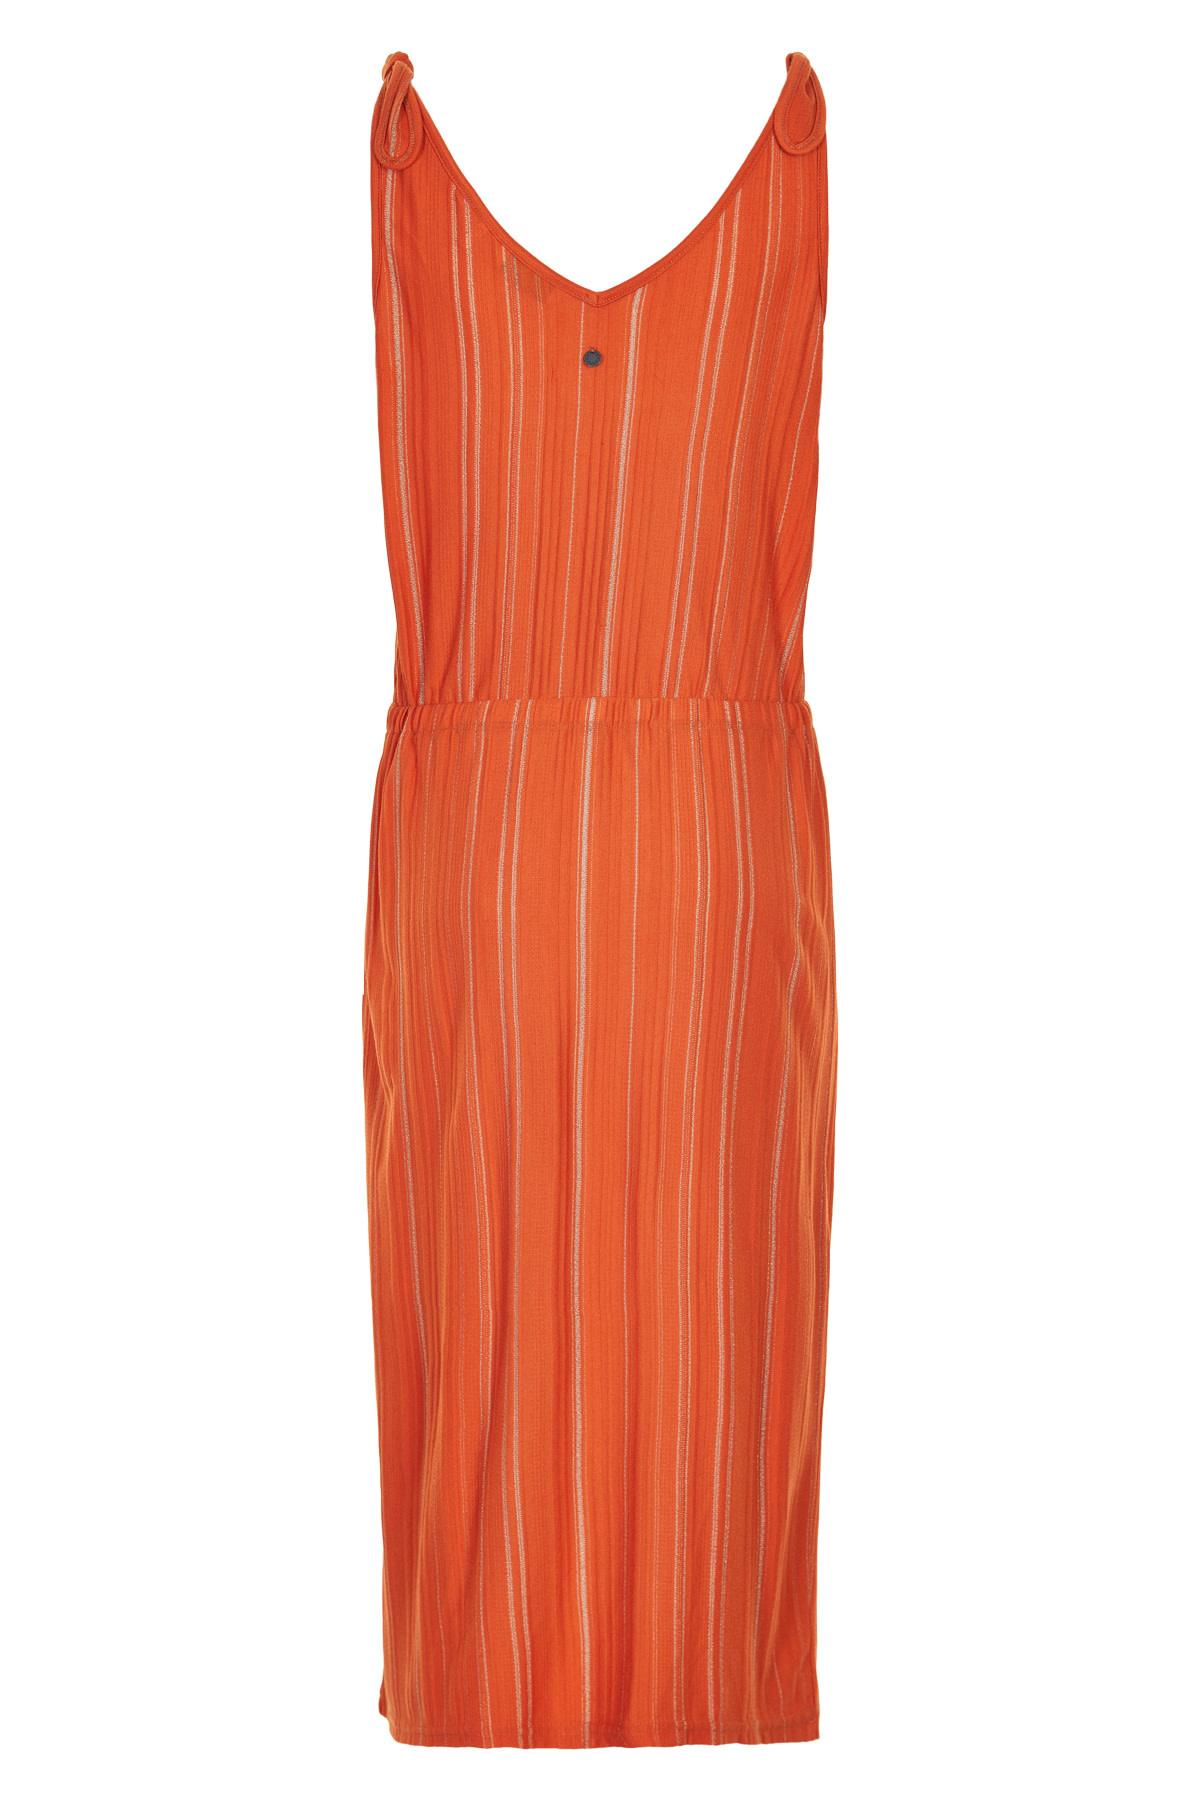 Nümph Bridger Jersey Dress